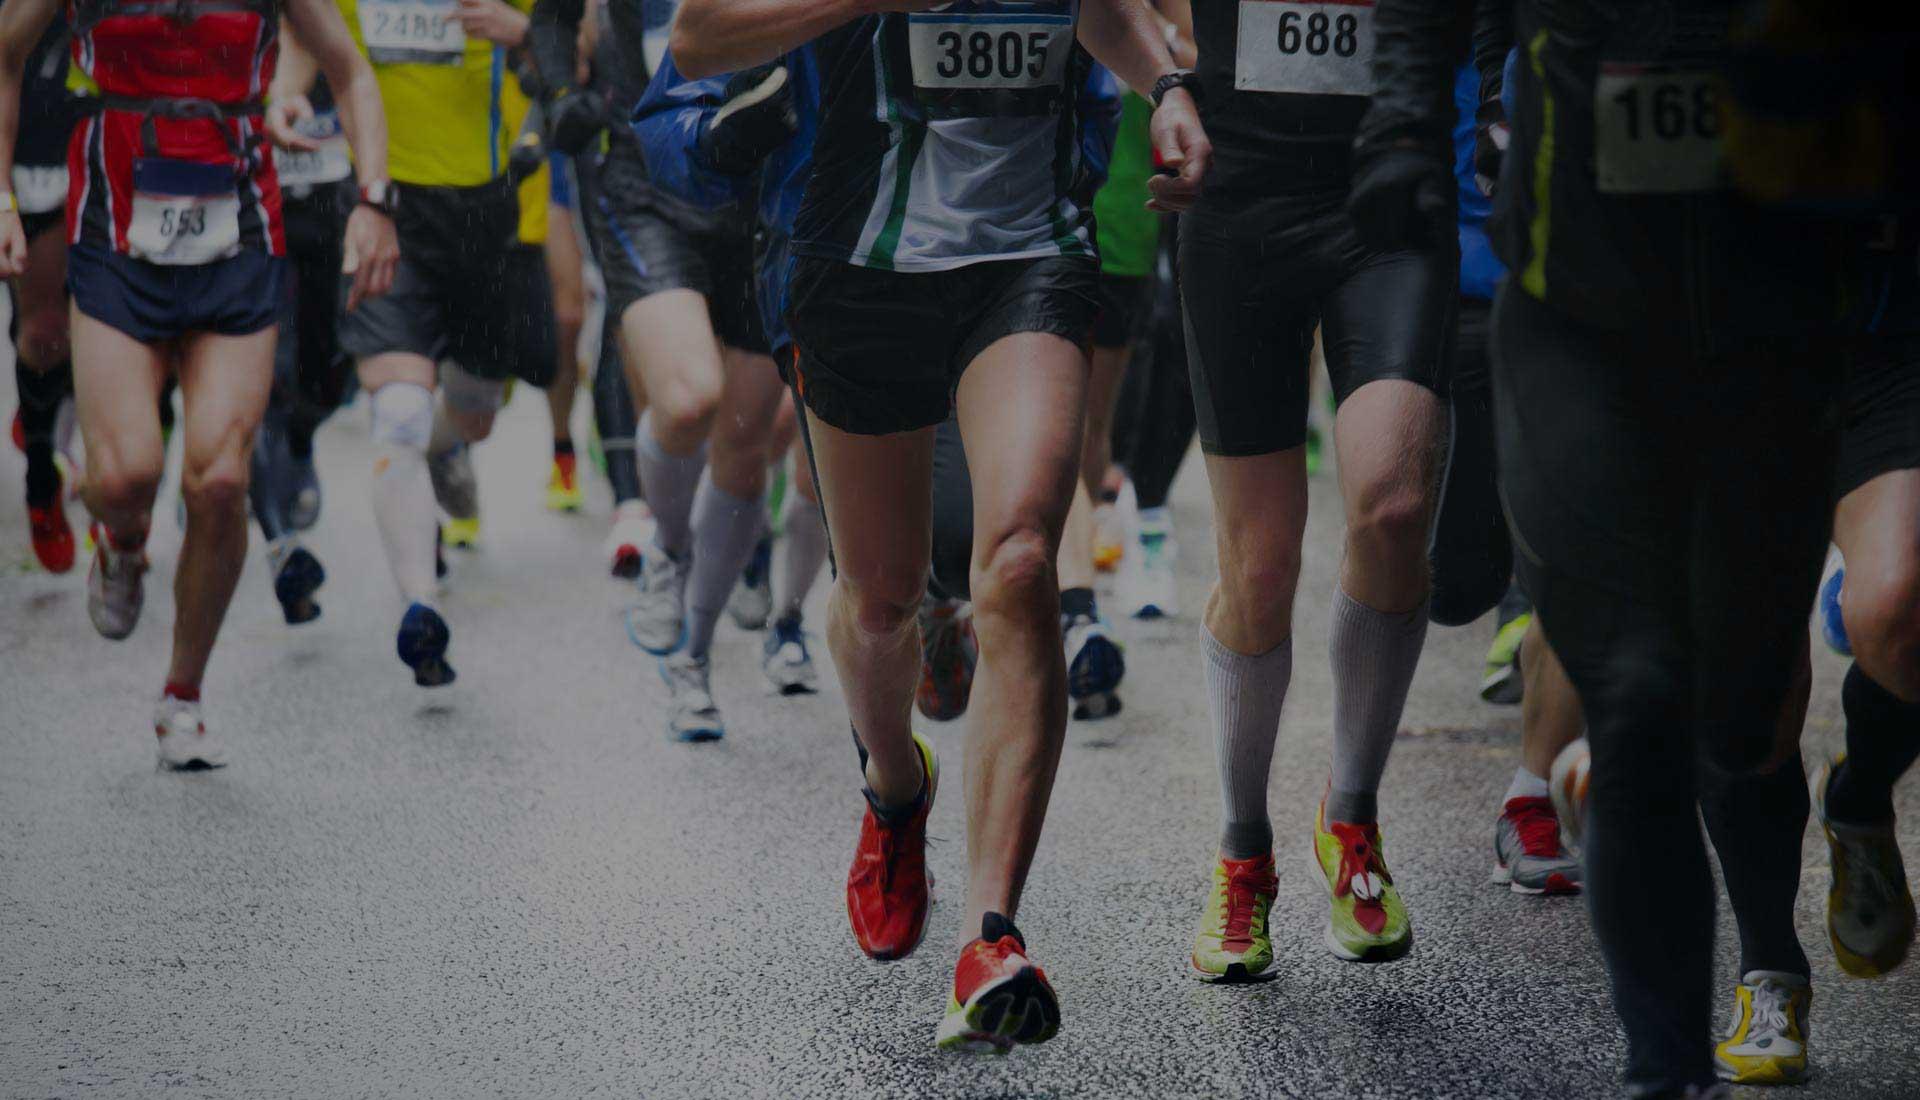 Marathon runners wearing Tyvek runner bibs